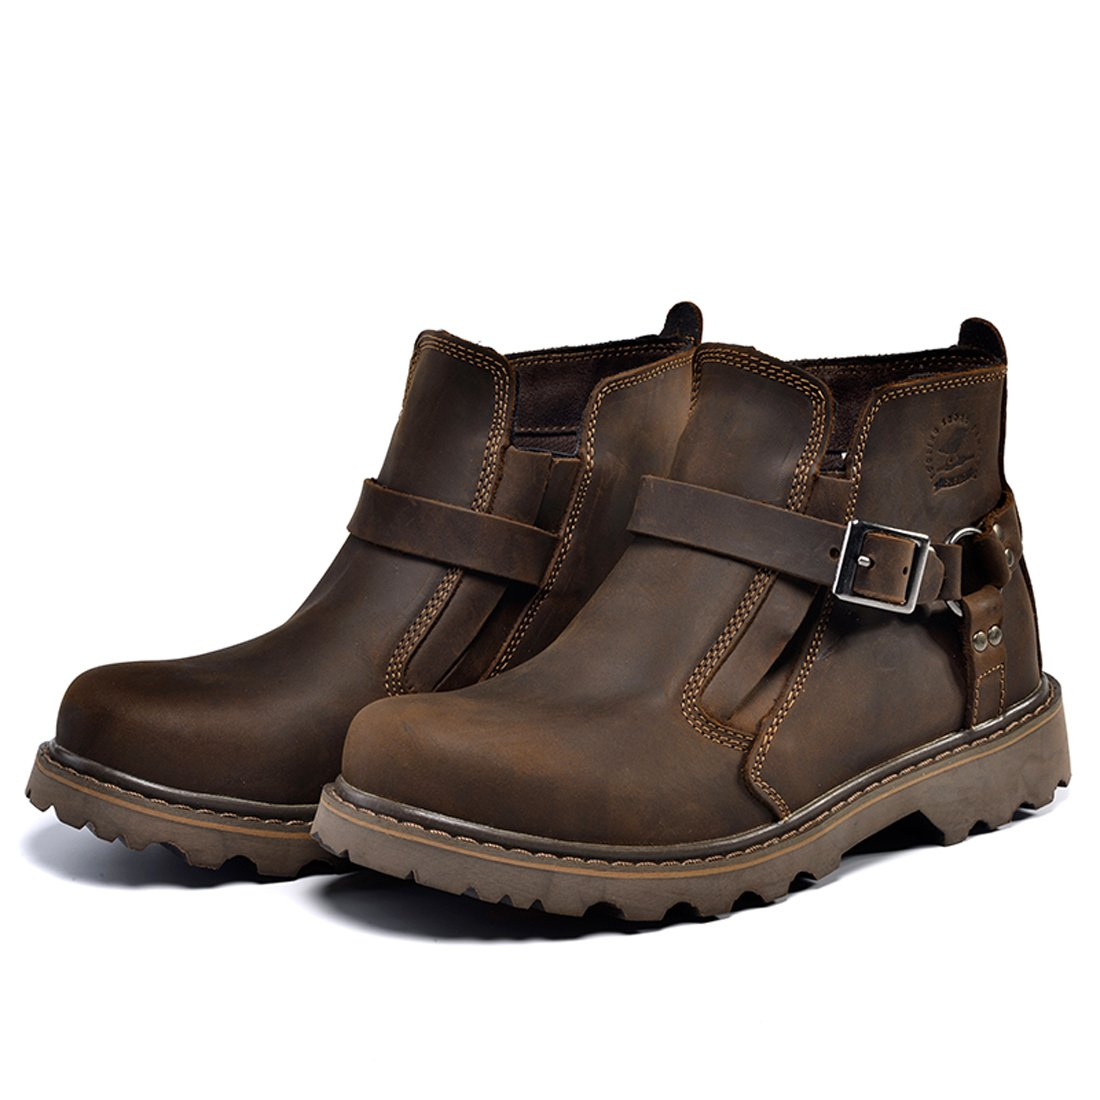 Z.SUO Men Women Unisex Couple Leather Two Wear Fashion Boot B06XTQV4QZ US M:9.5 Dark Brown